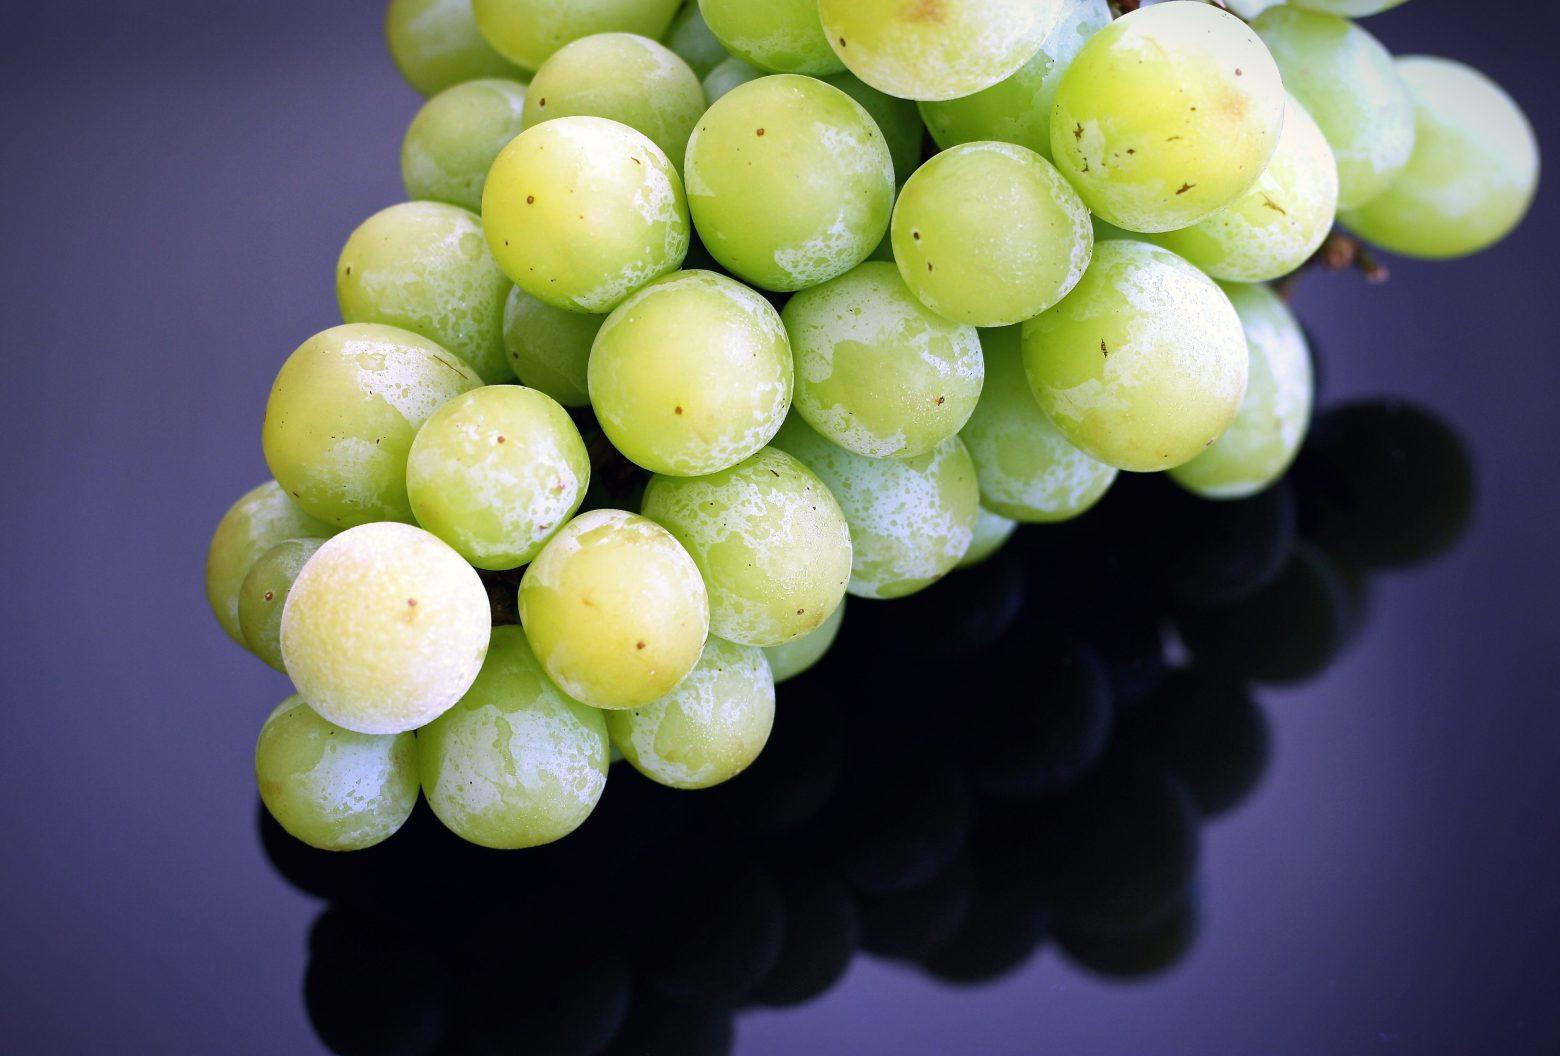 grapes-1476089